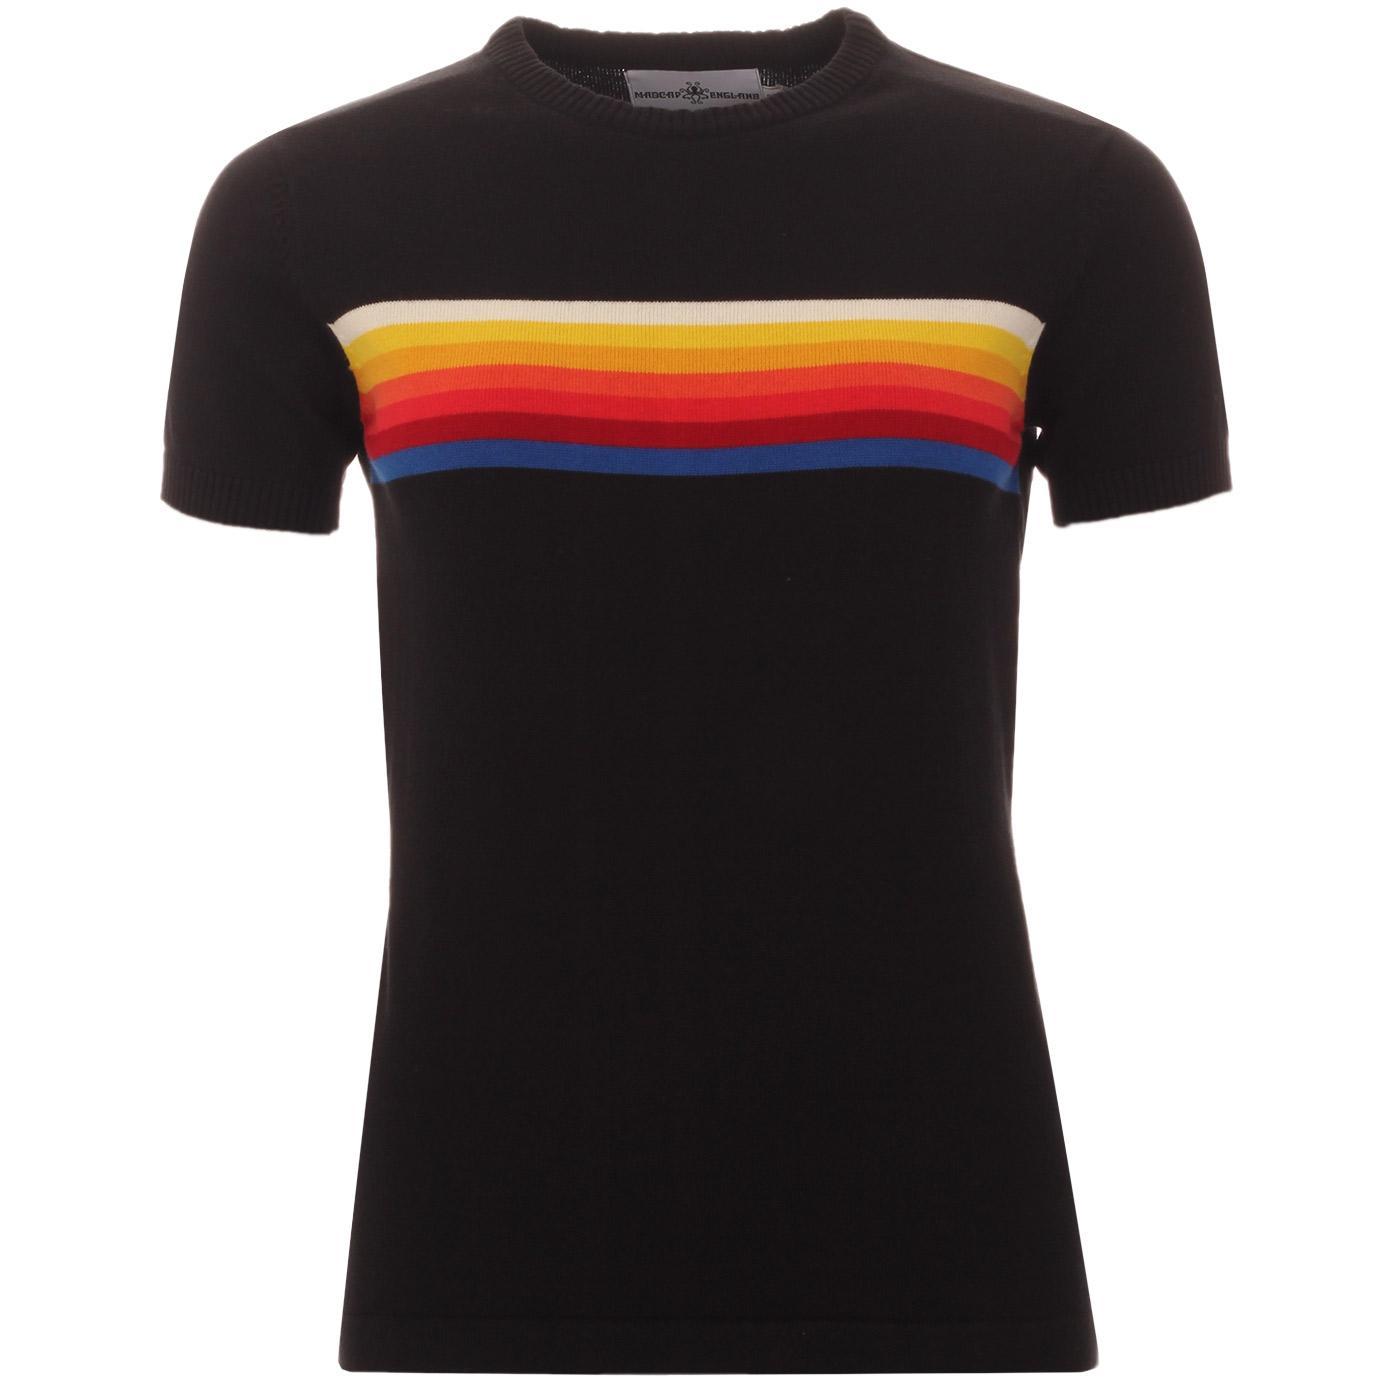 Madcap England Britpop Women's Retro Mod Rainbow Chest Stripe Knitted Tee in Black